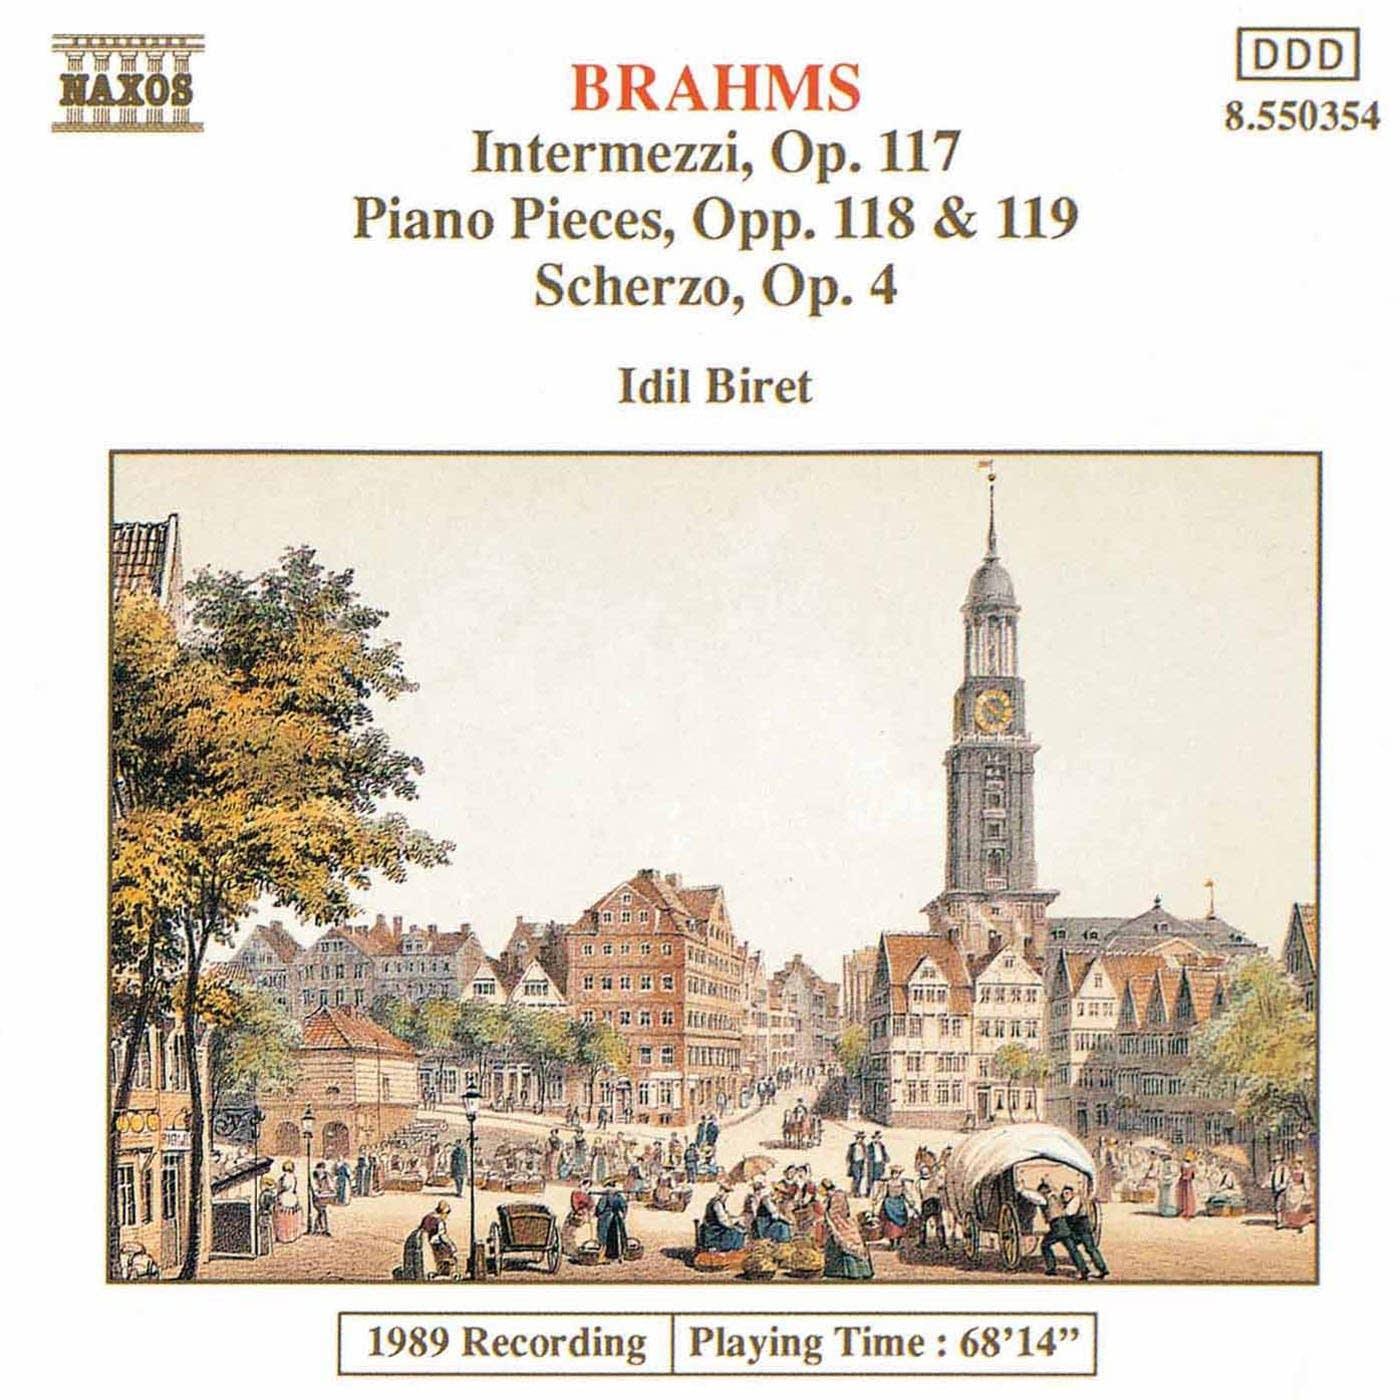 Johannes Brahms - Intermezzo No. 1, Op. 117